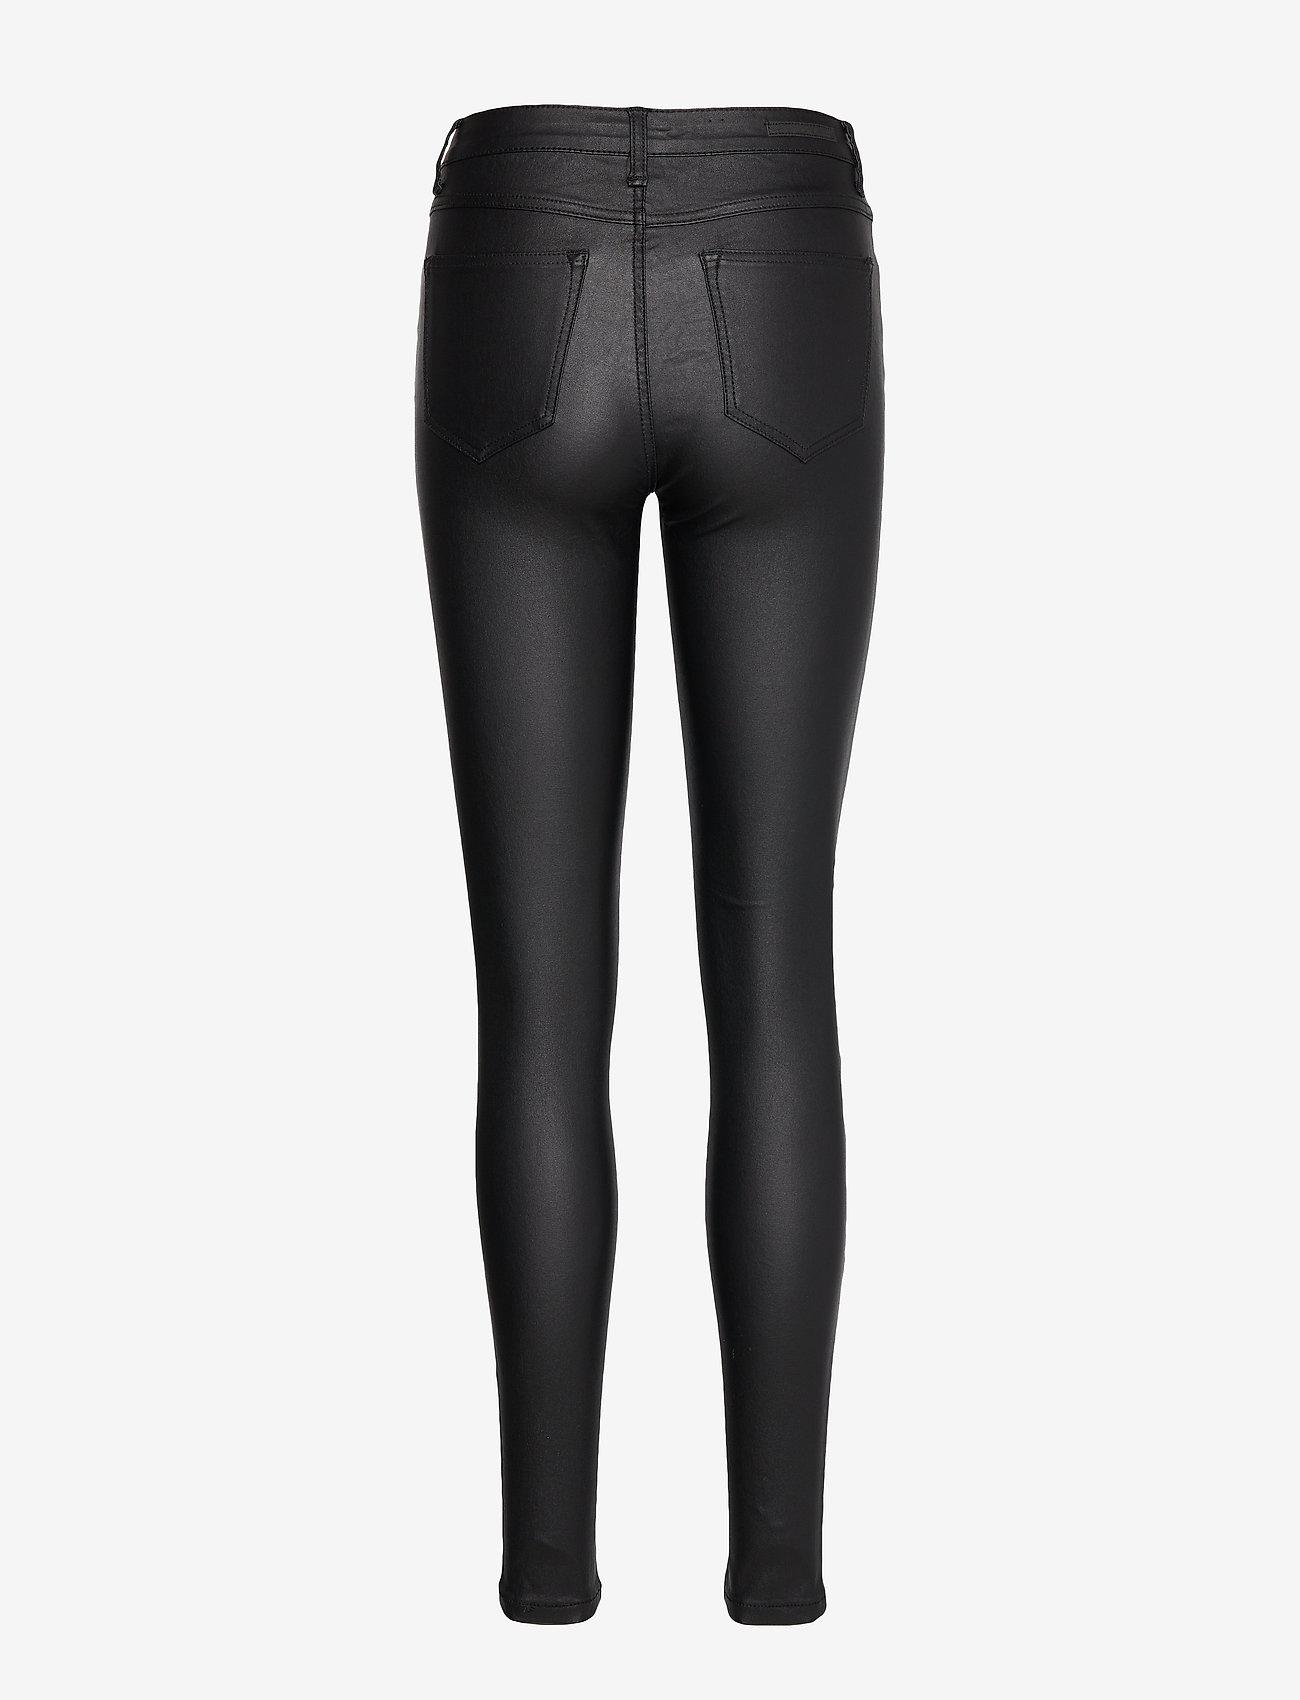 b.young - Kato Kiko jeans - - skinny jeans - black - 1